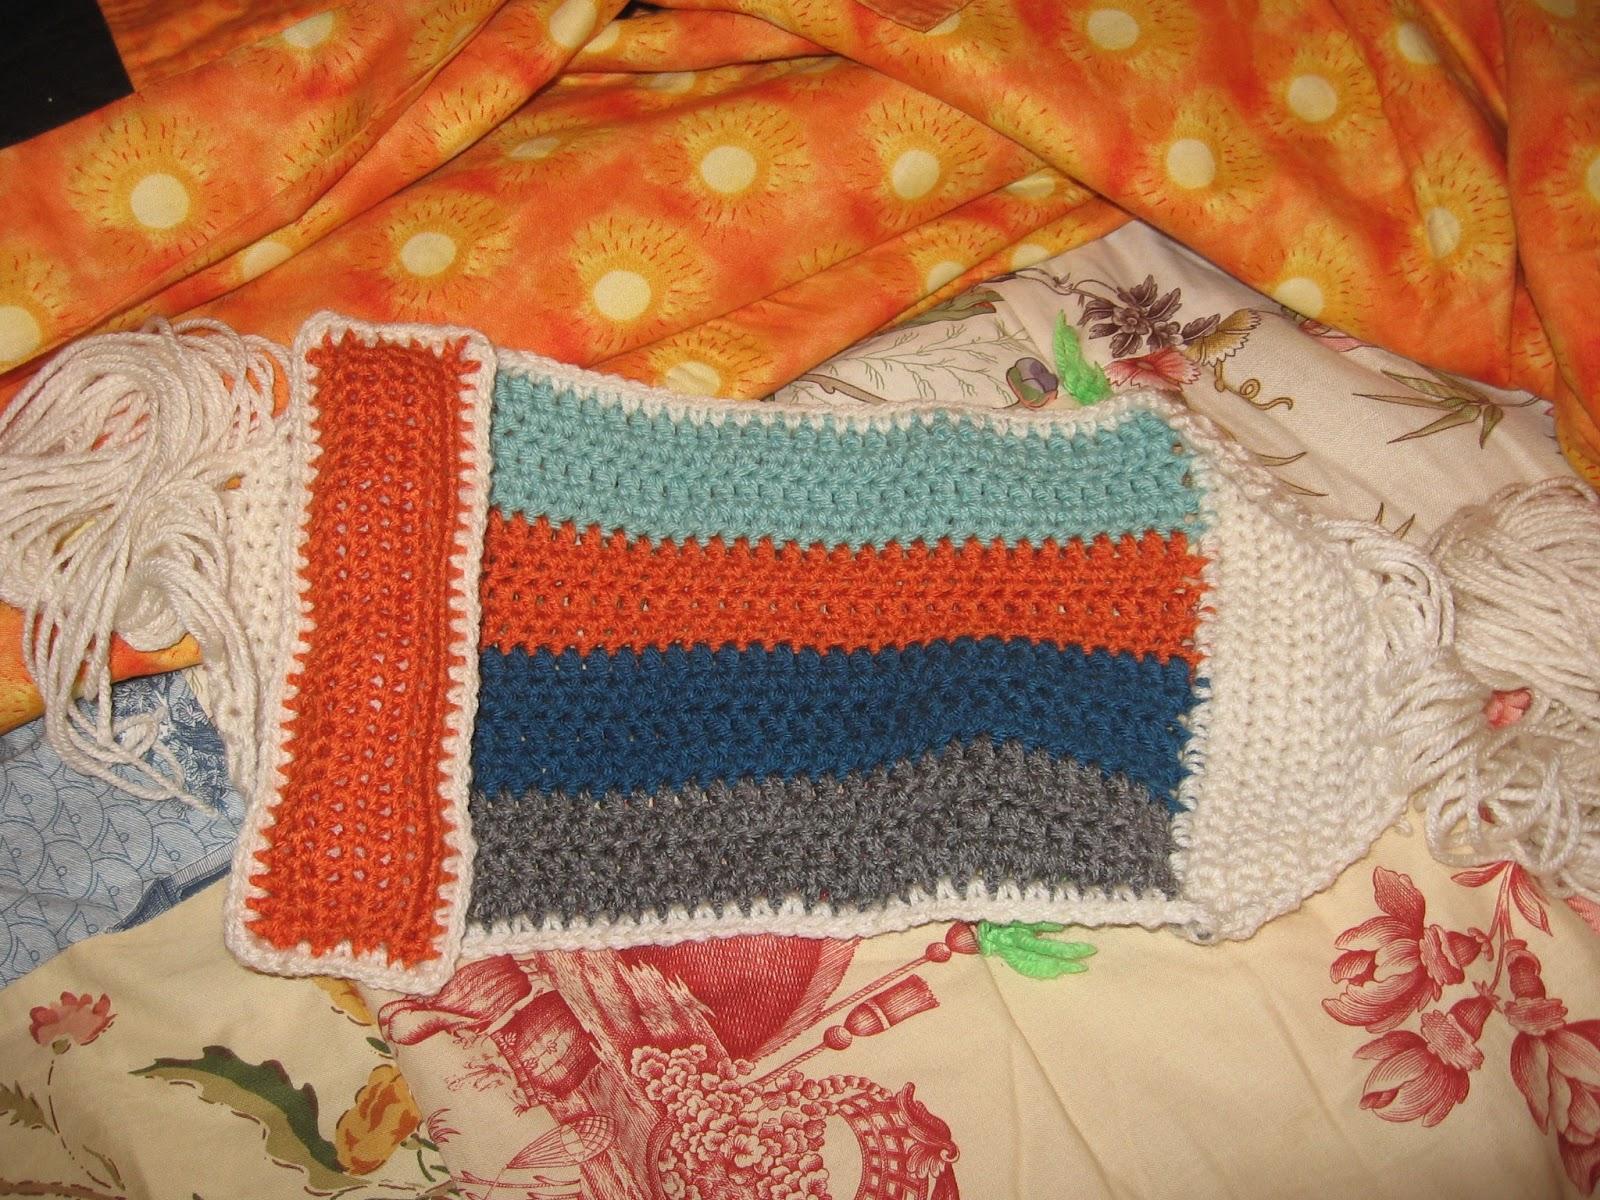 Crafting Adventures Rat Hammock Free Crochet Pattern